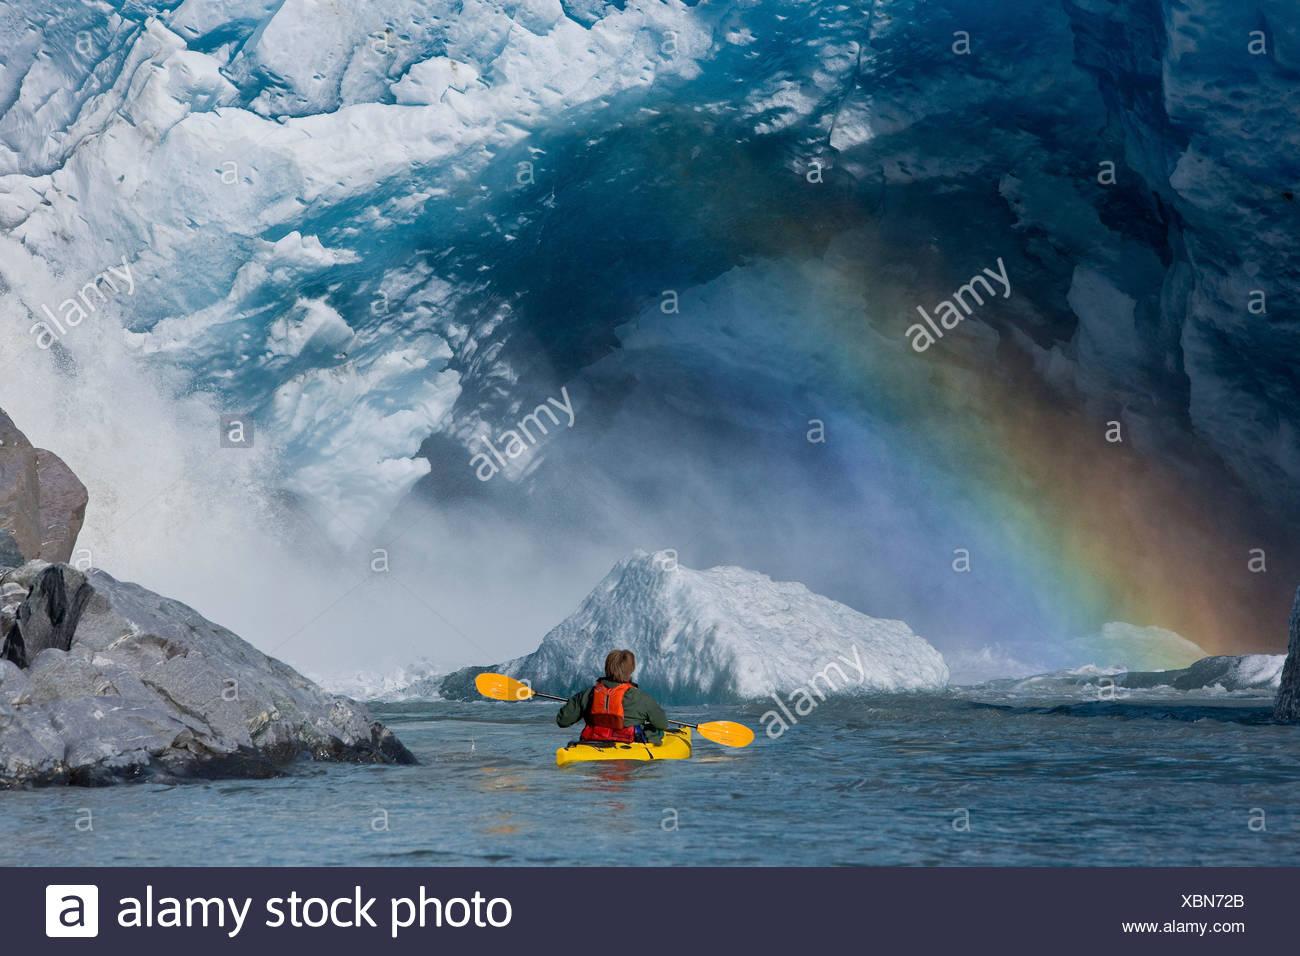 A kayaker explores a melt stream gushing from beneath Mendenhall Glacier, Mendenhall Lake, Tongass National Forest, Alaska - Stock Image